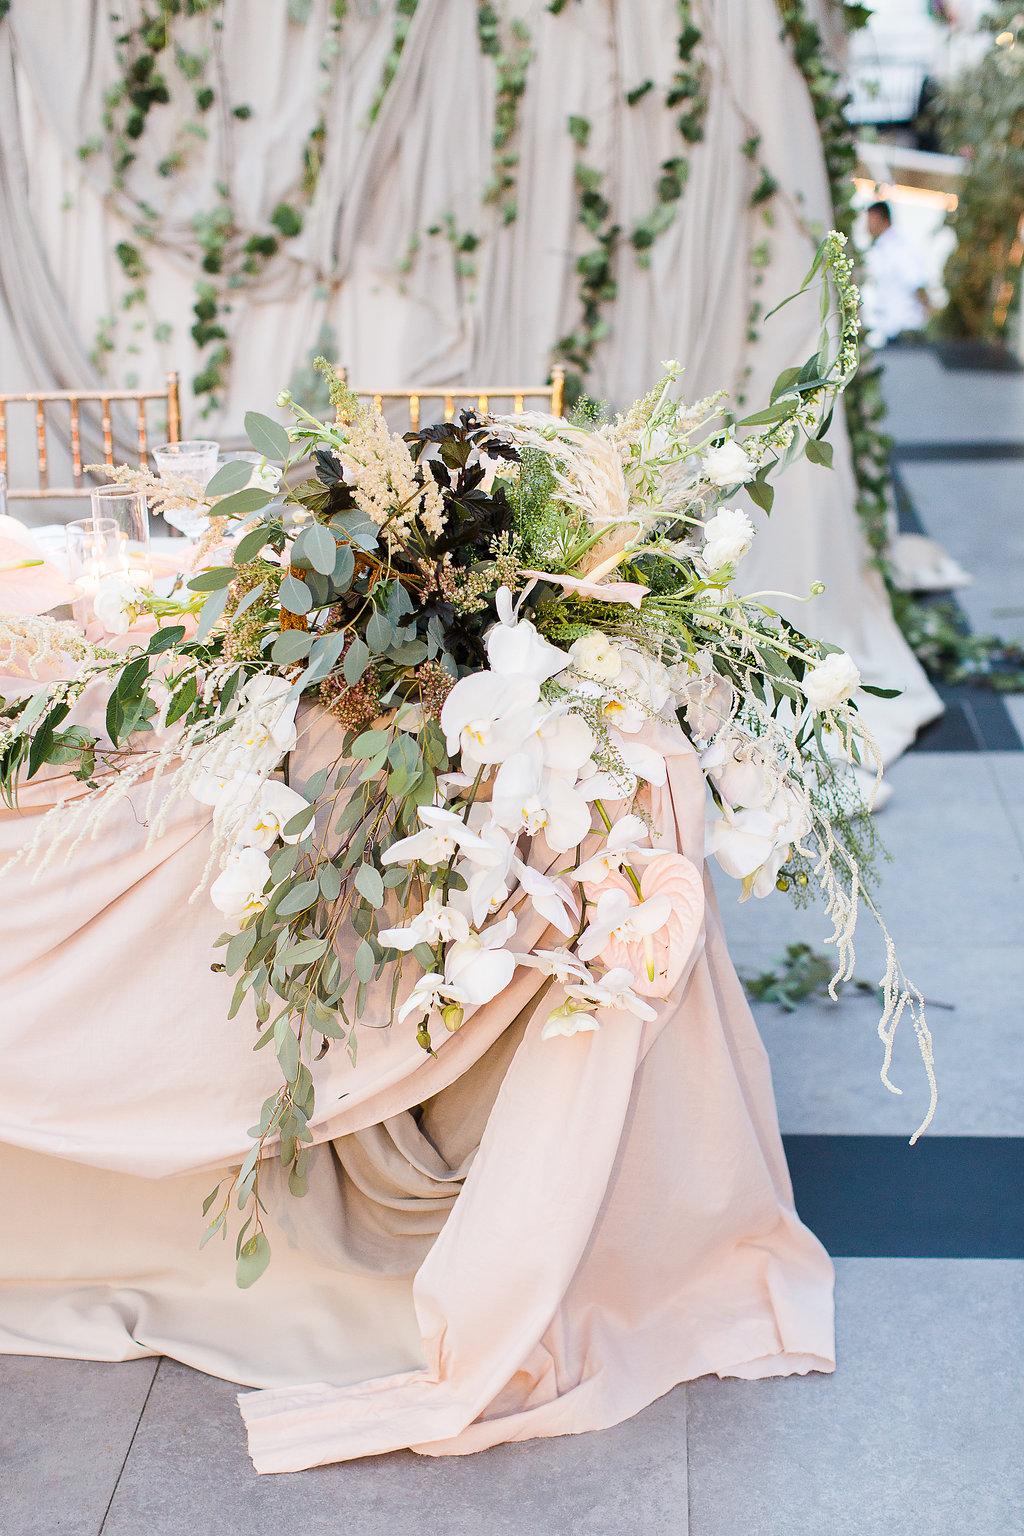 Luxe destination wedding in Jakarta and Bankok | fine art film wedding photographer Tanja Kibogo 4004.JPG